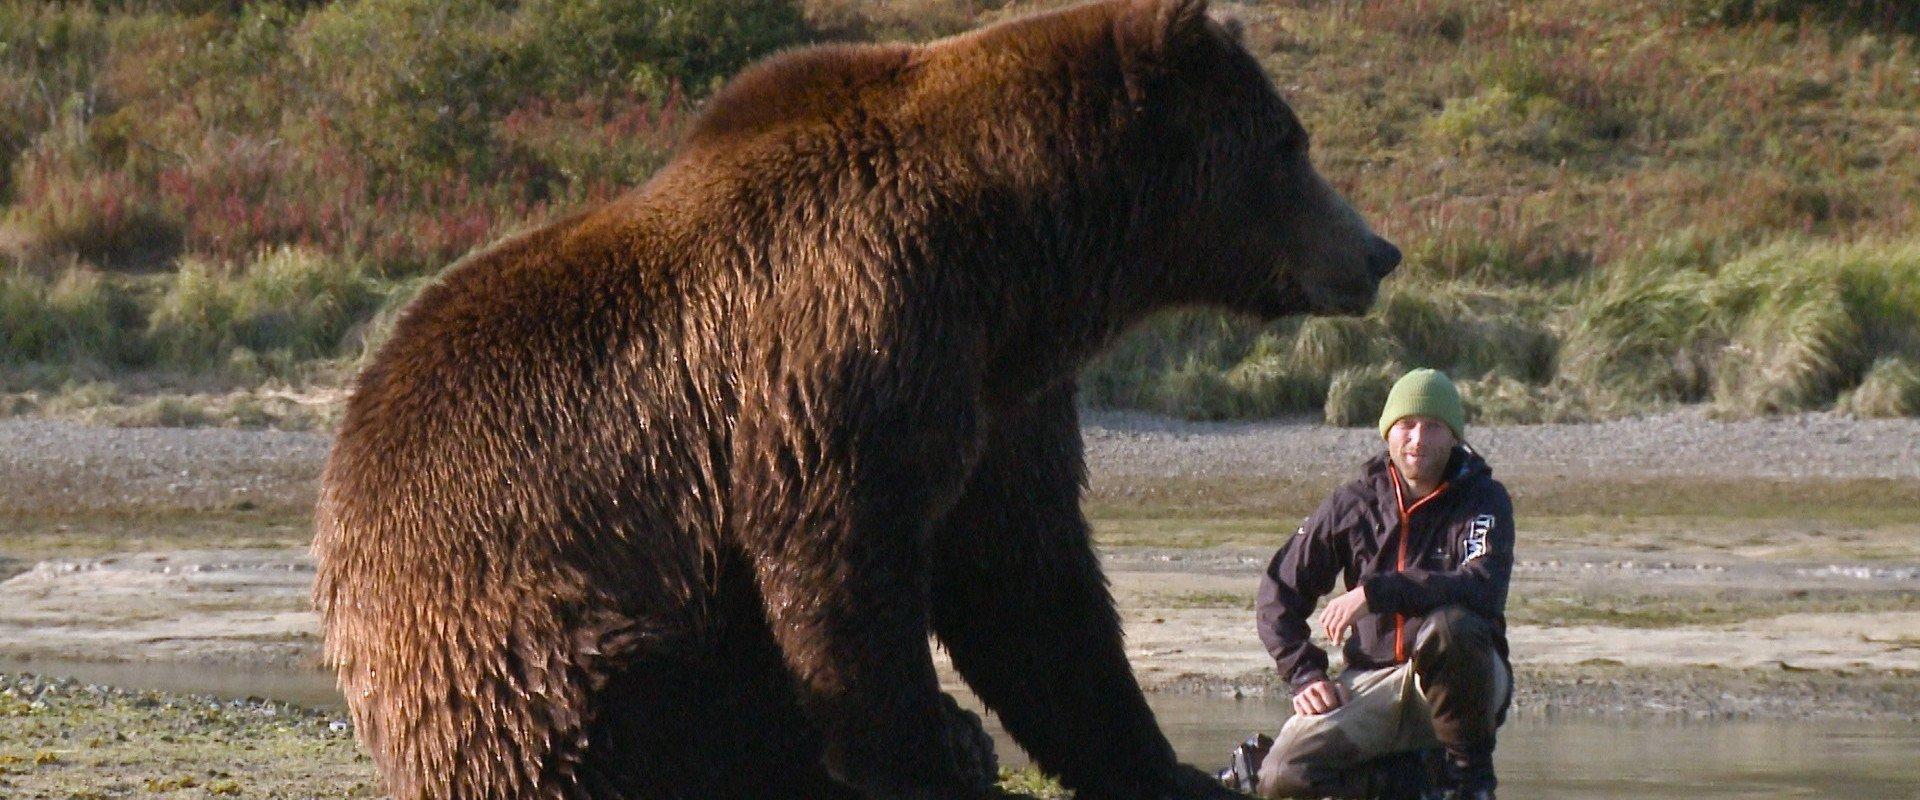 vimff bear like background